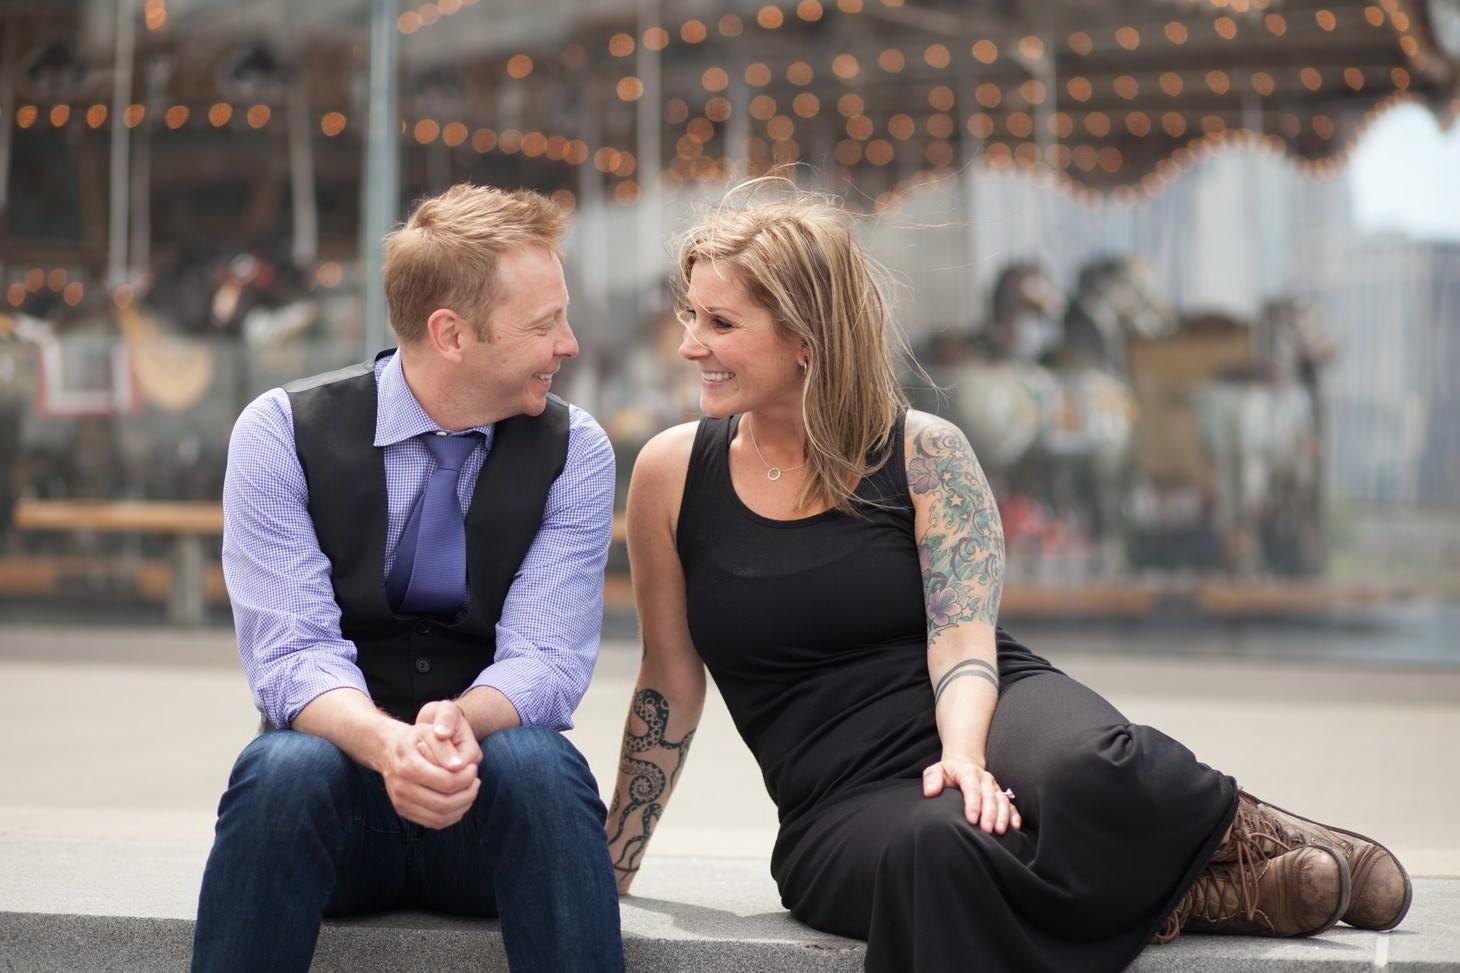 nyc-wedding-photographer-brooklyn-bridge-smitten-chickens-engagement-brooklyn-bridge-002.jpg